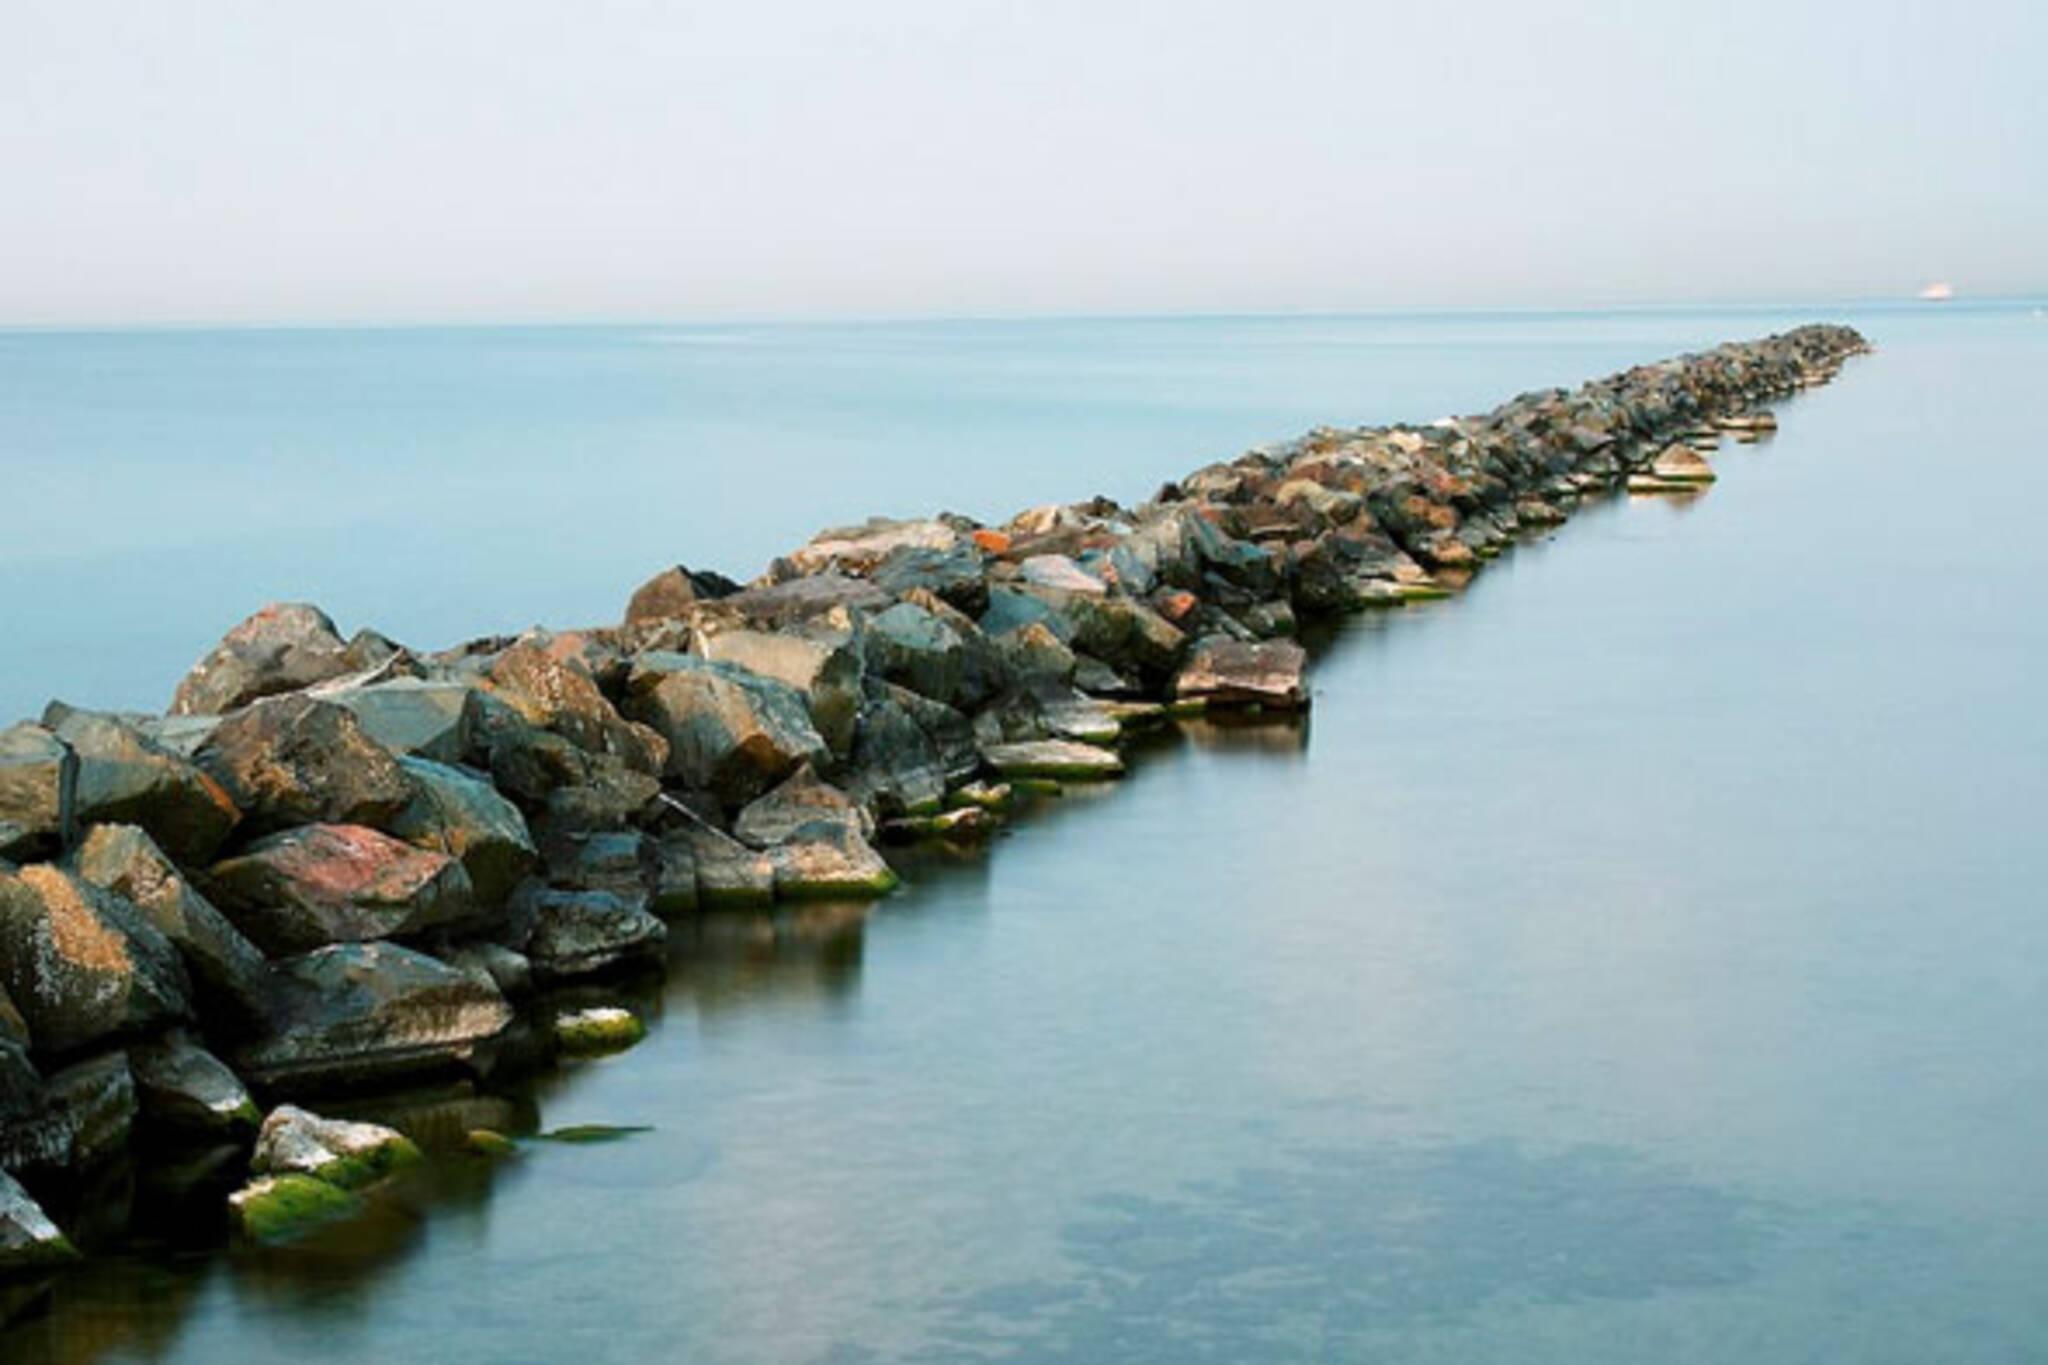 toronto islands rocks lake ontario